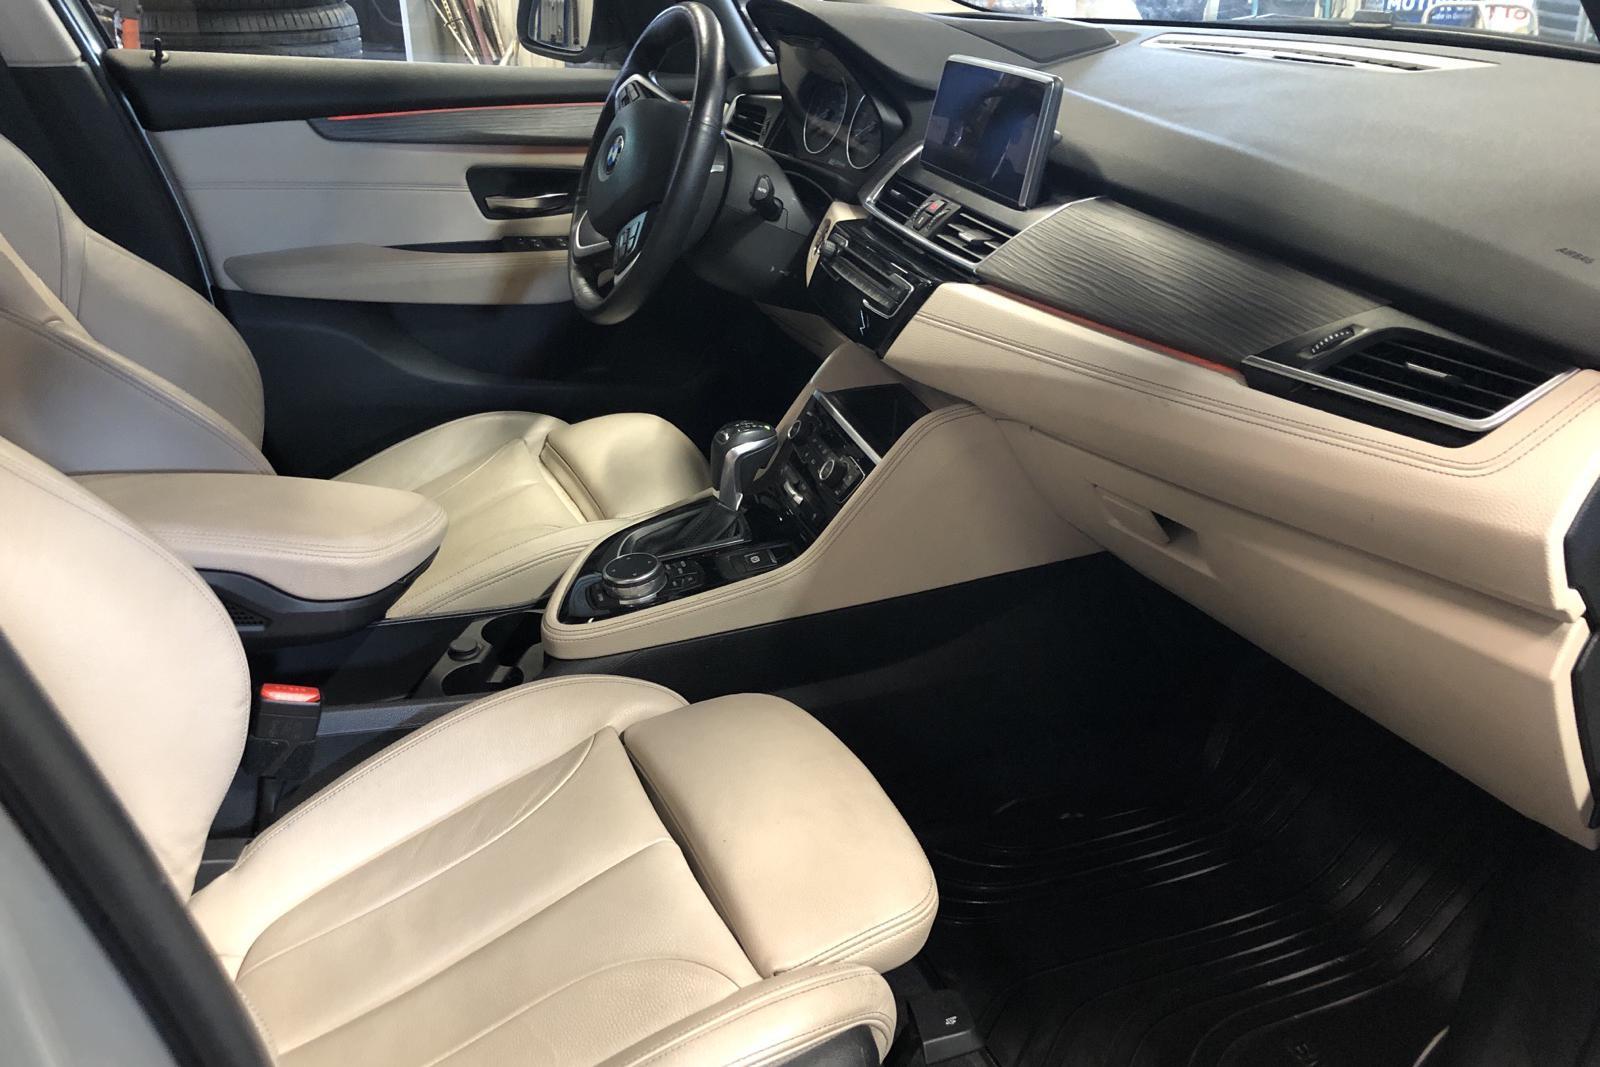 BMW 225xe Active Tourer, F45 (224hk) - 82 320 km - Automatic - silver - 2016